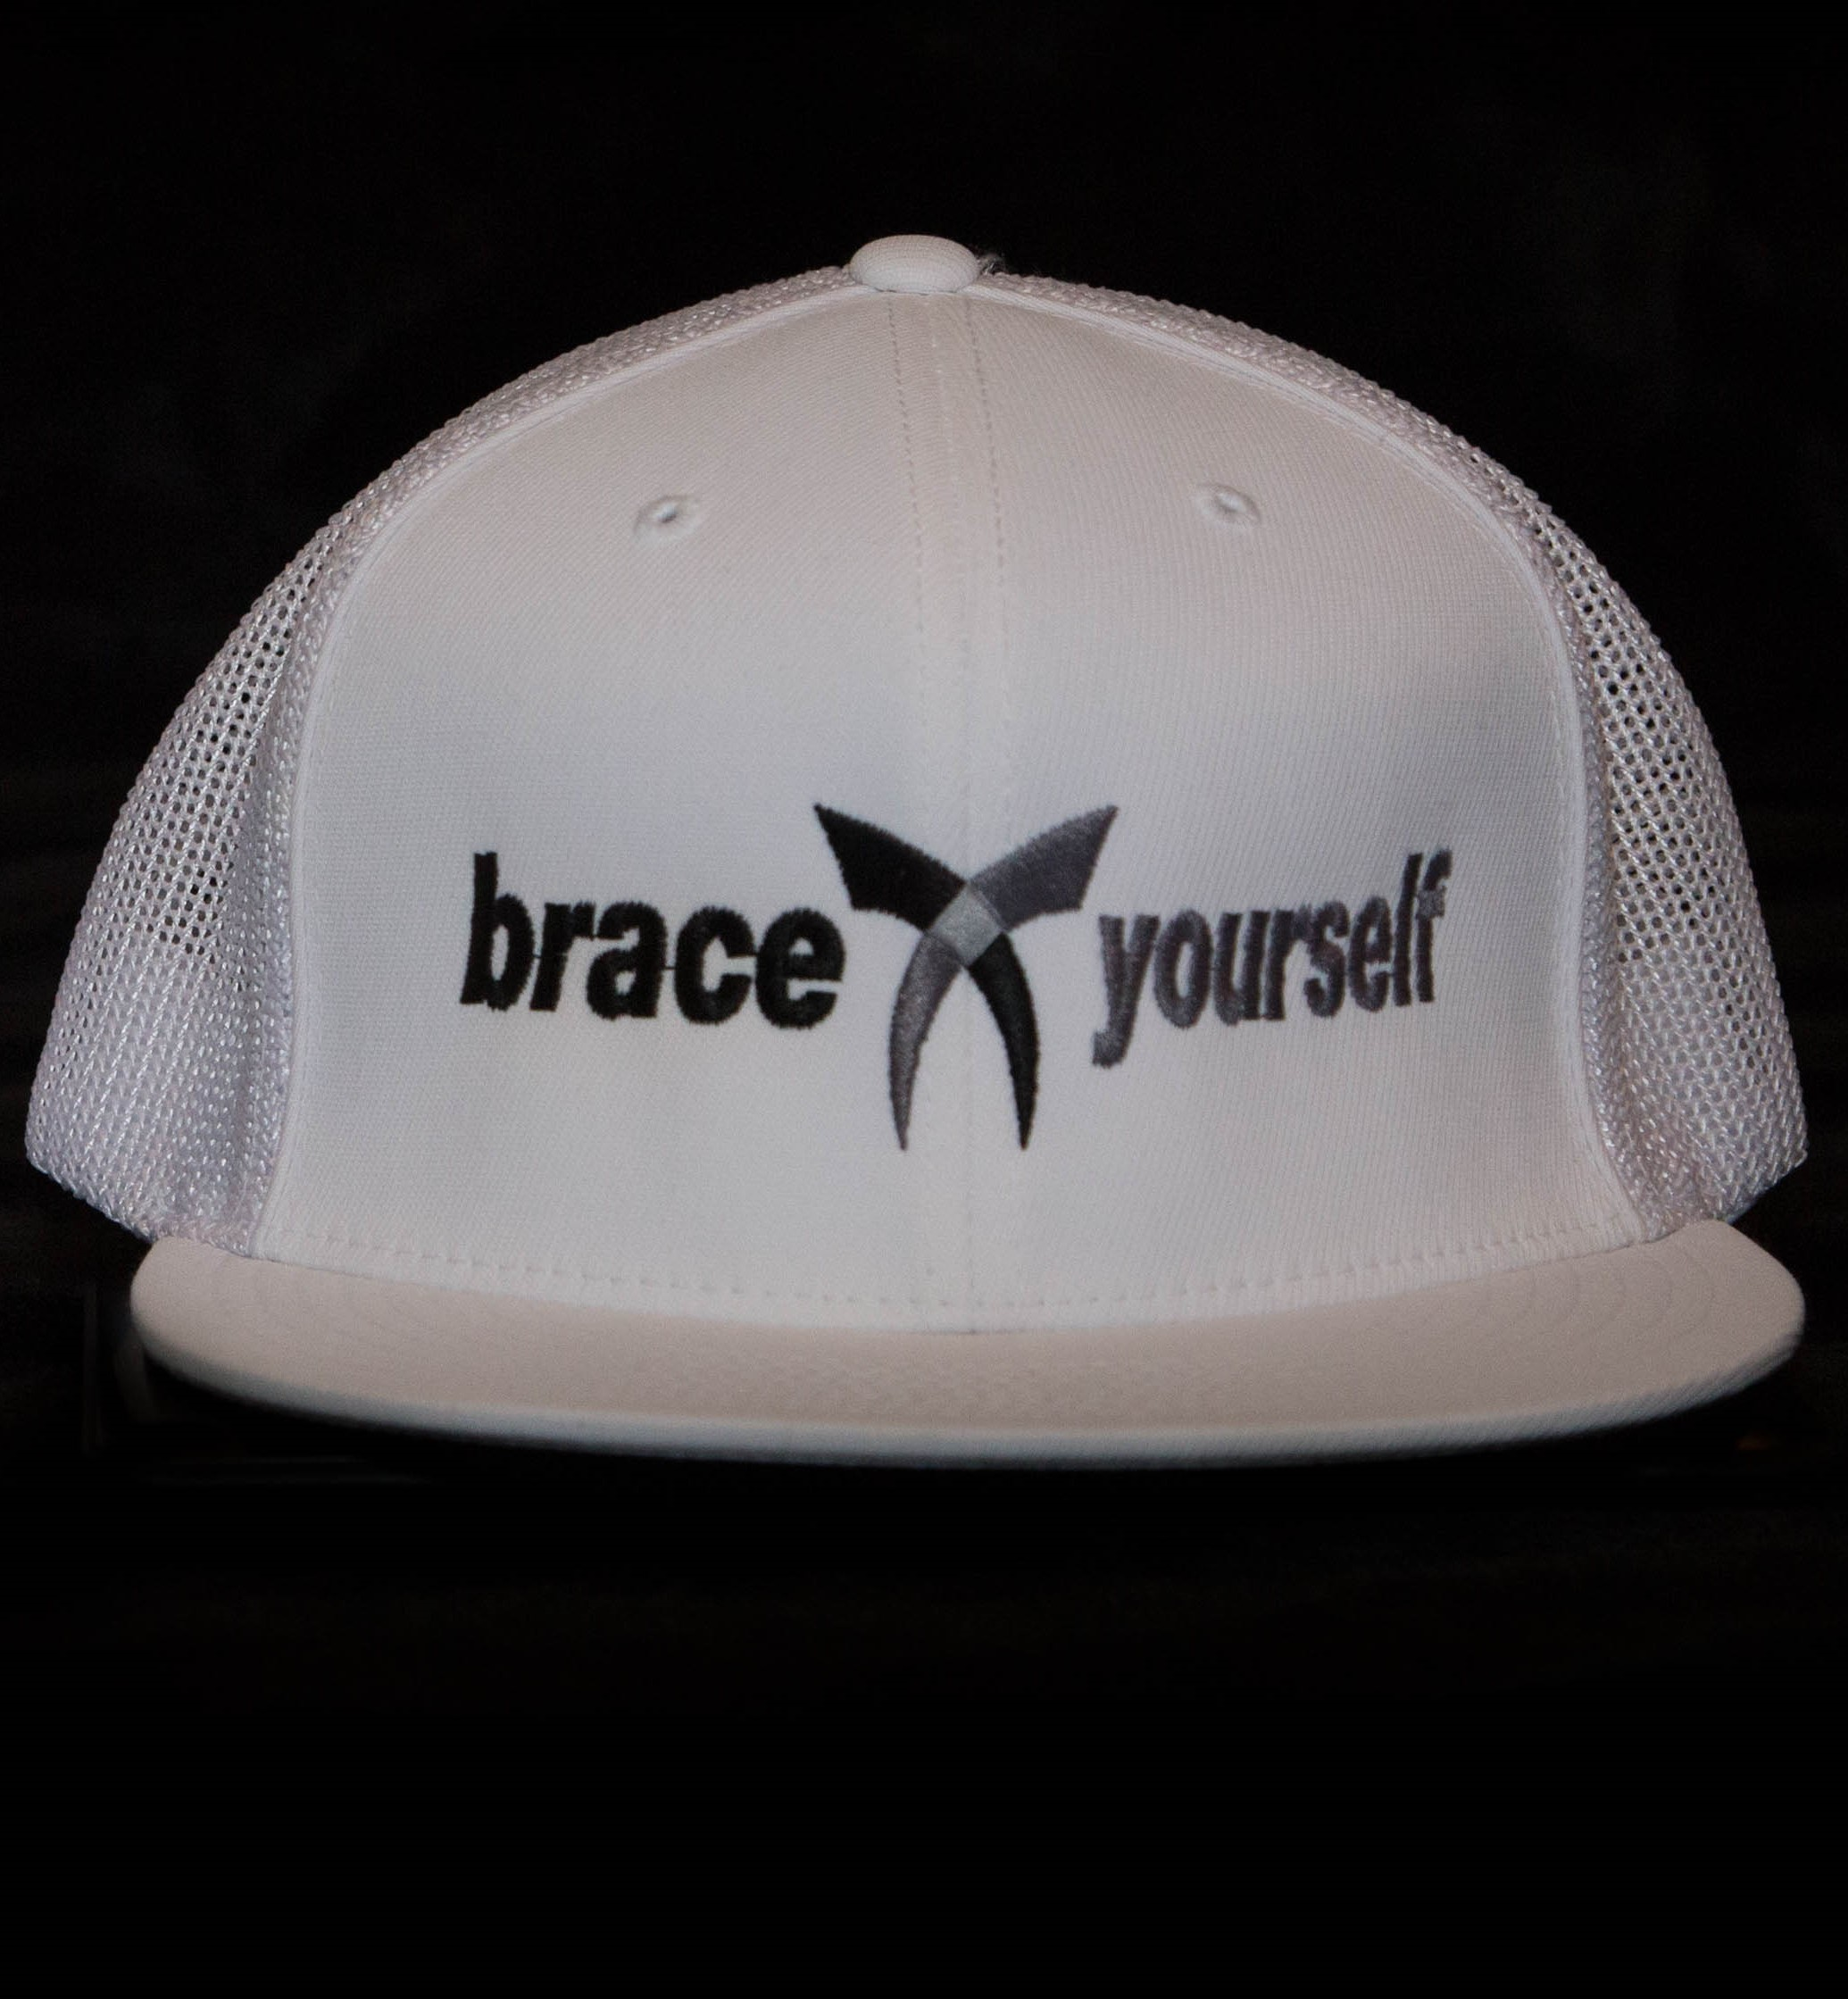 BRACE YOURSELF HAT - WHITE 00020